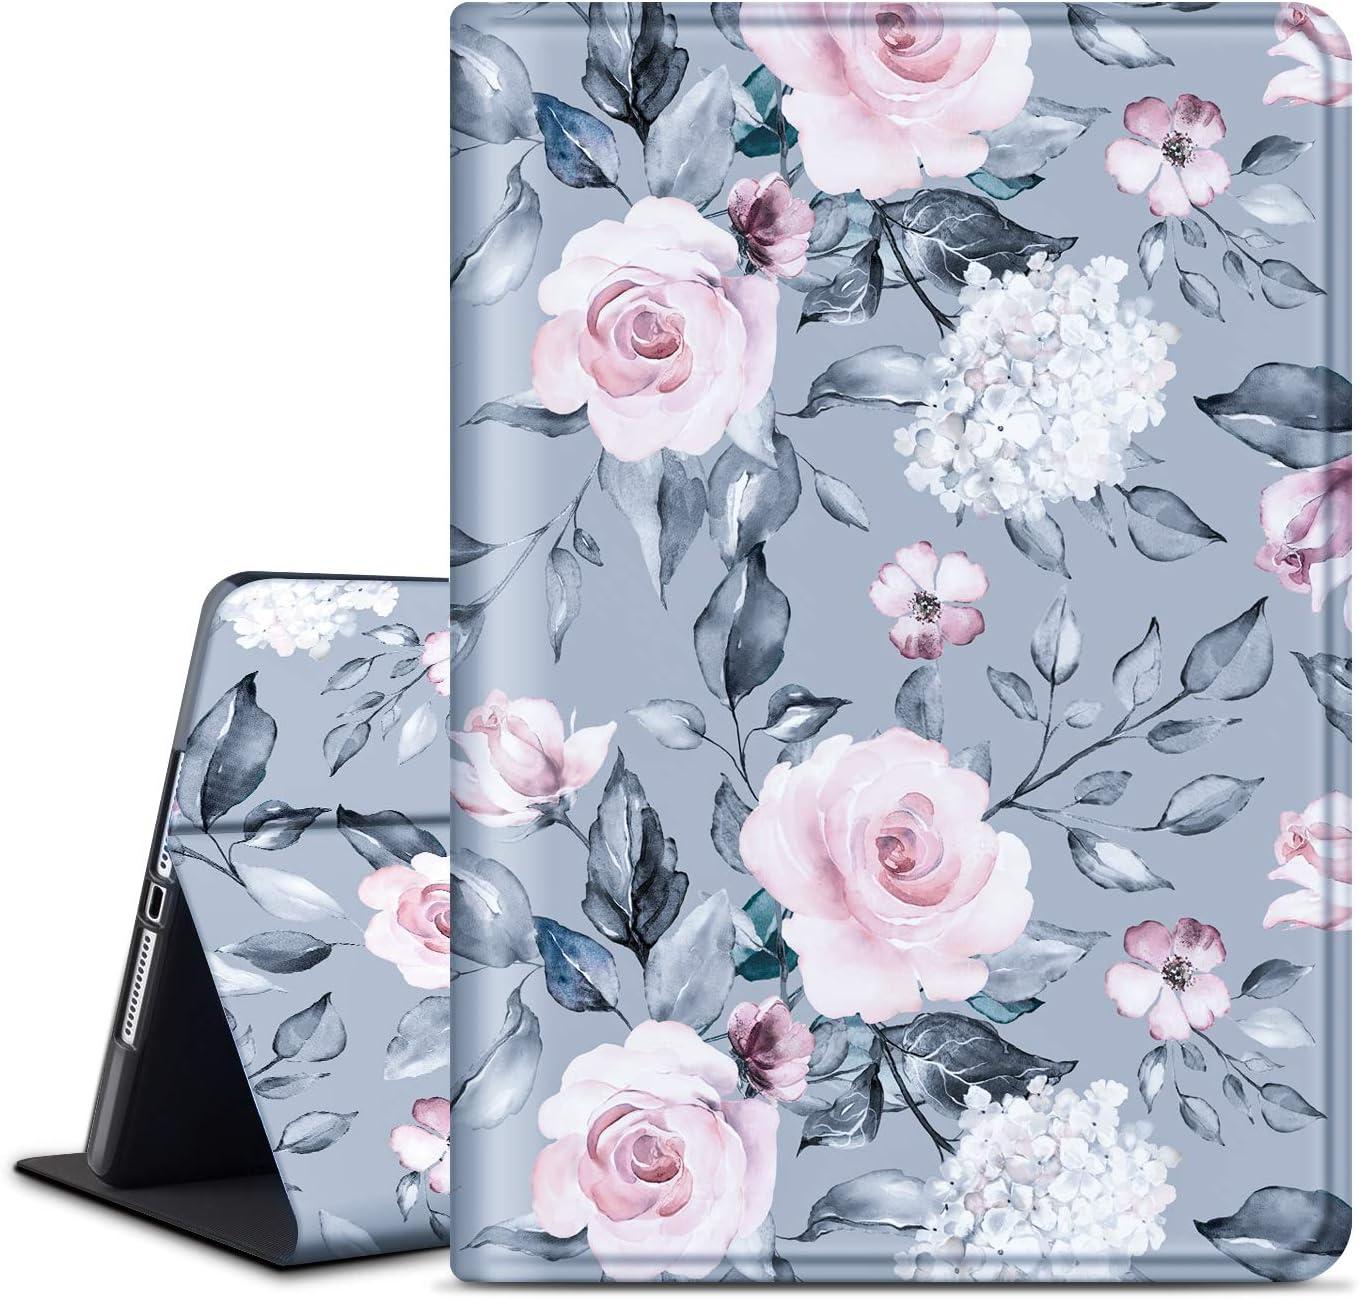 ANERIMST Case for iPad Pro 10.5 / iPad Air 3, Microfiber Lining, Soft TPU, Protective Smart Case, Auto Sleep/Wake Cover for iPad Air 10.5 Inch 2019/iPad Pro 10.5 2017 (penoy)